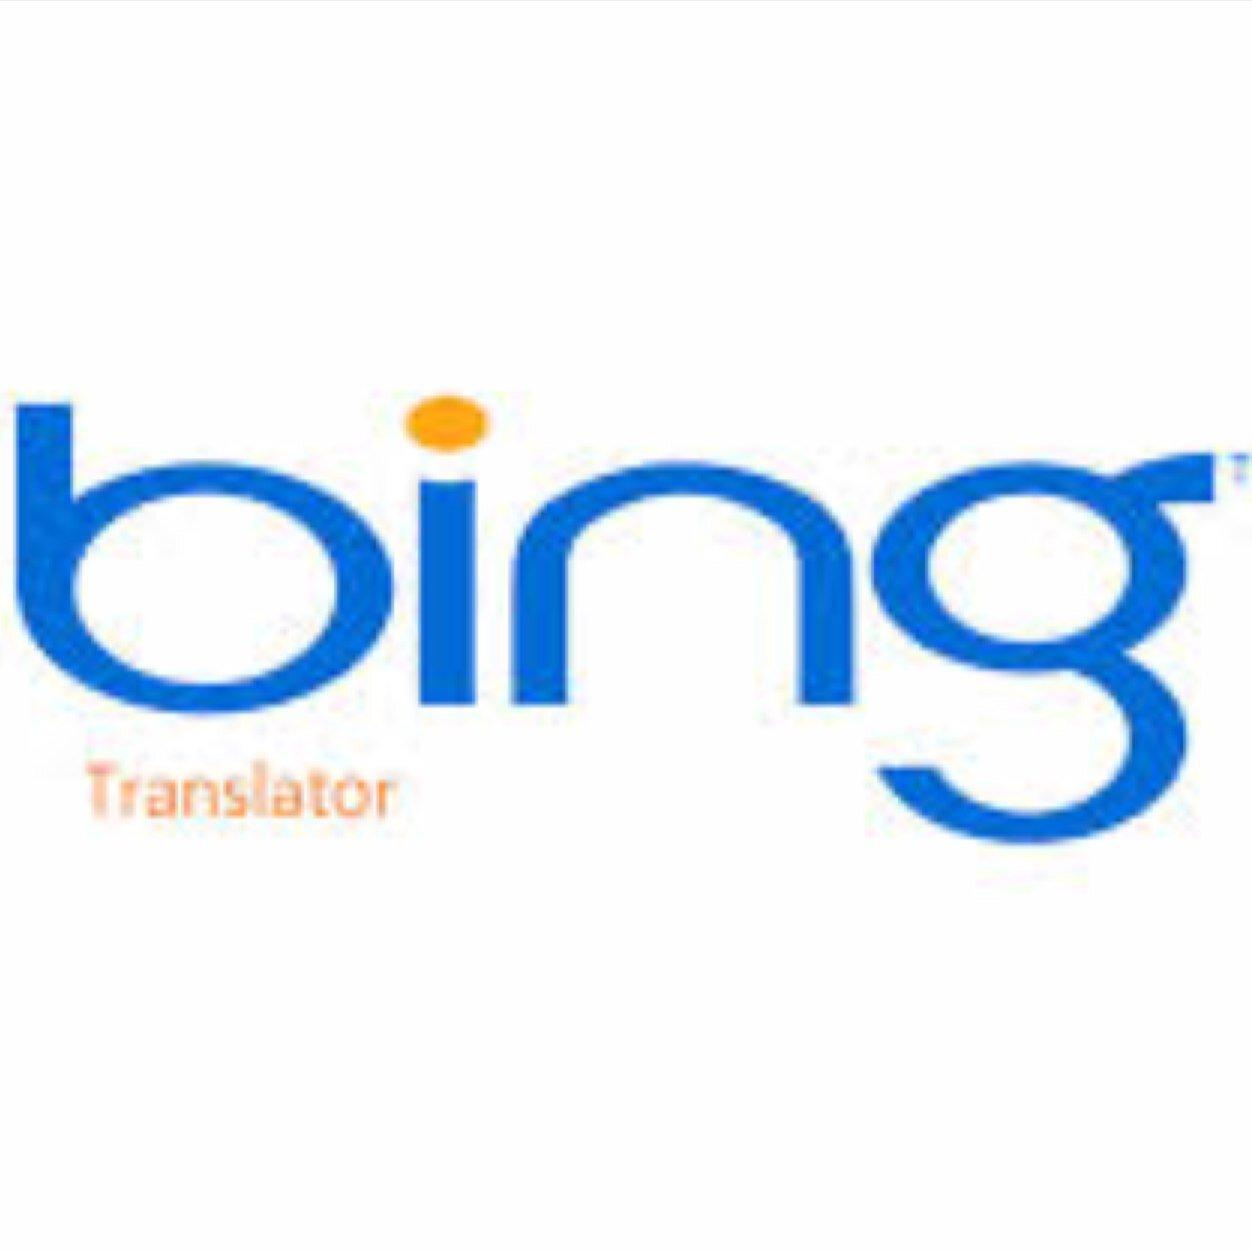 My Saves Bing: Bing Translations (@BingTranslate)